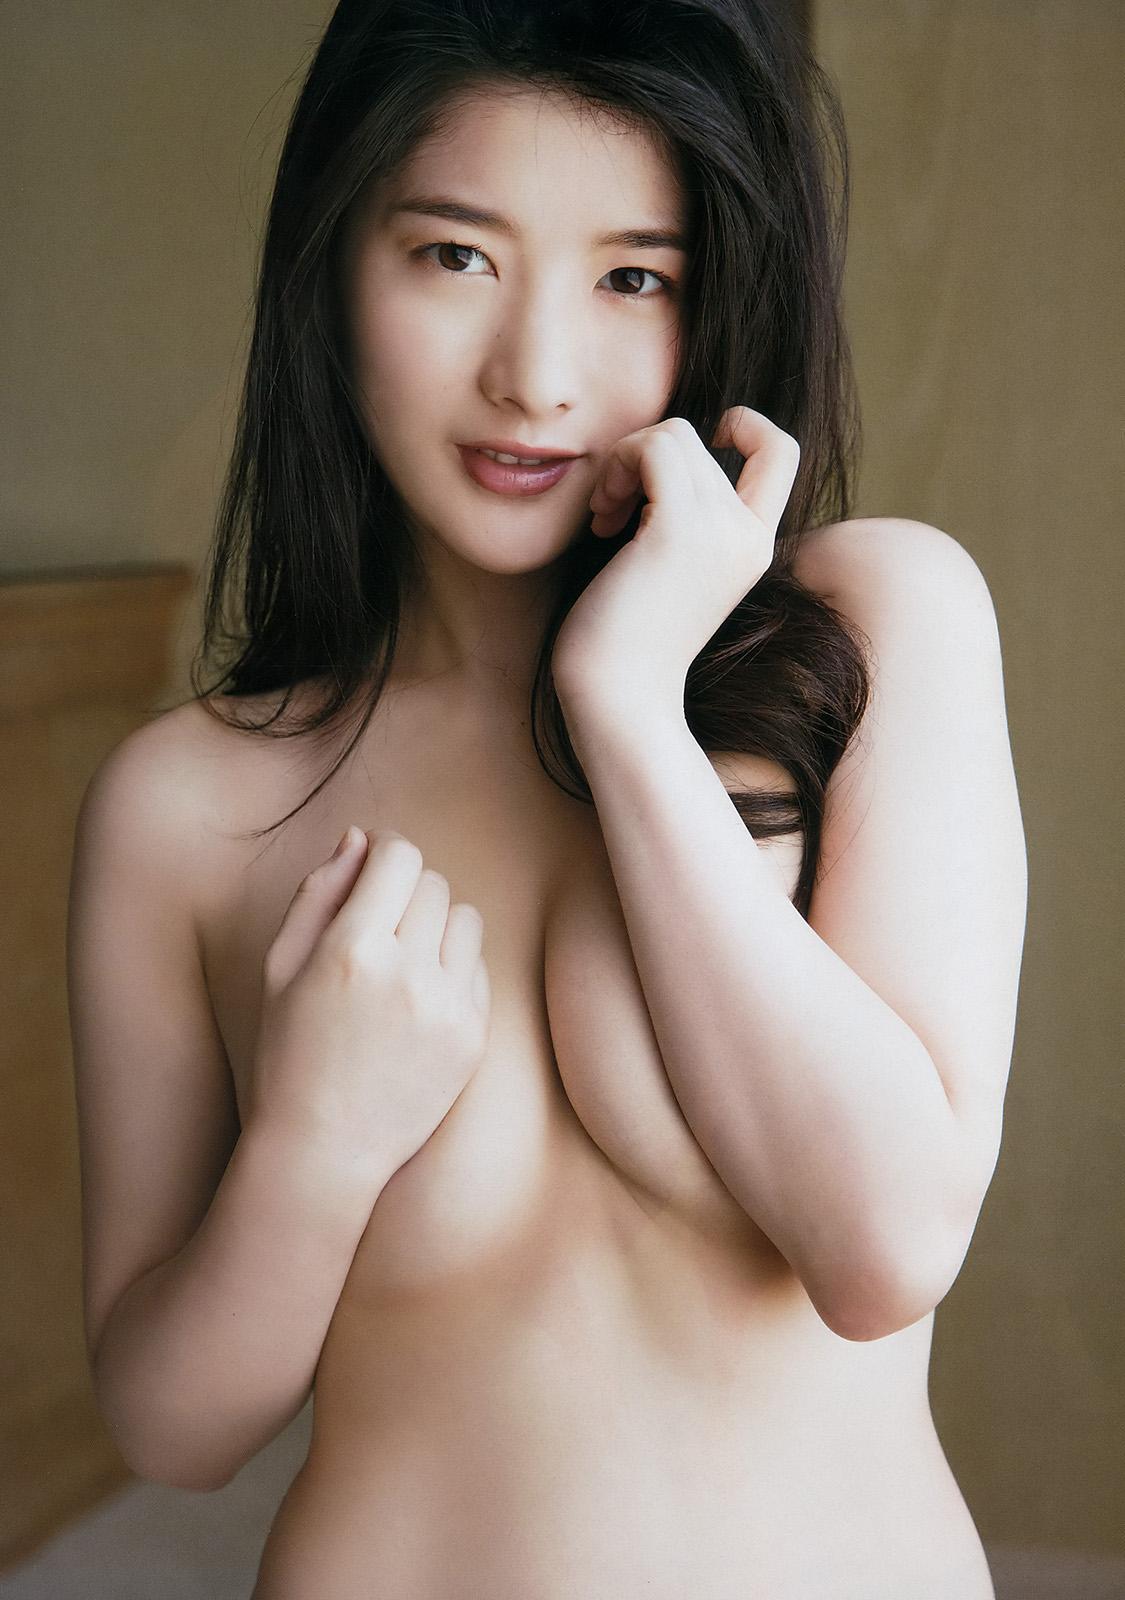 Kamiya Erina 神谷えりな, Big Comic Spirits 2017 No.38 (週刊スピリッツ 2017年38号)